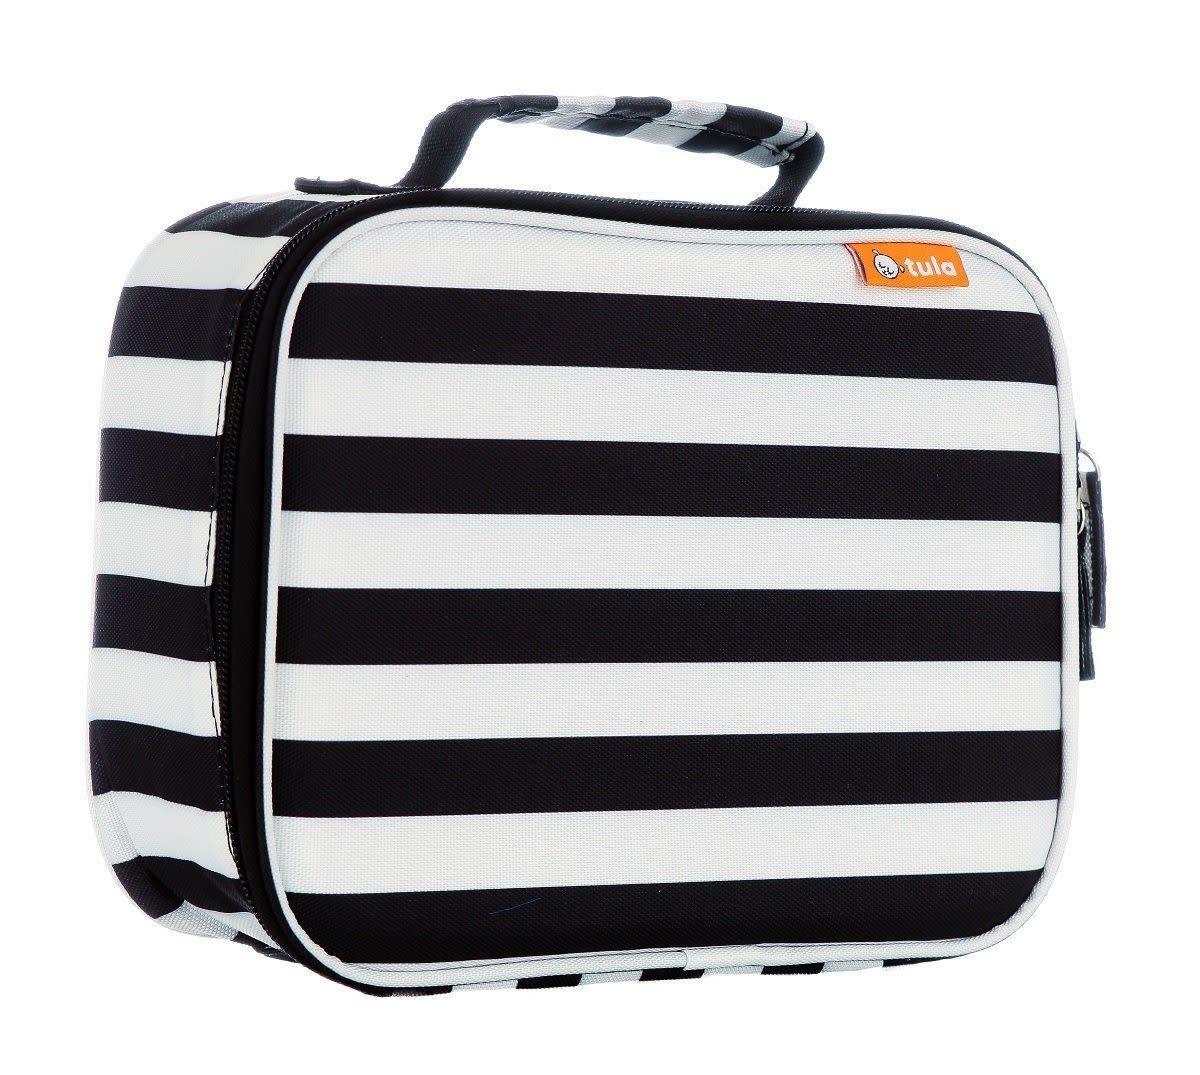 Tula Tula Lunch Bag